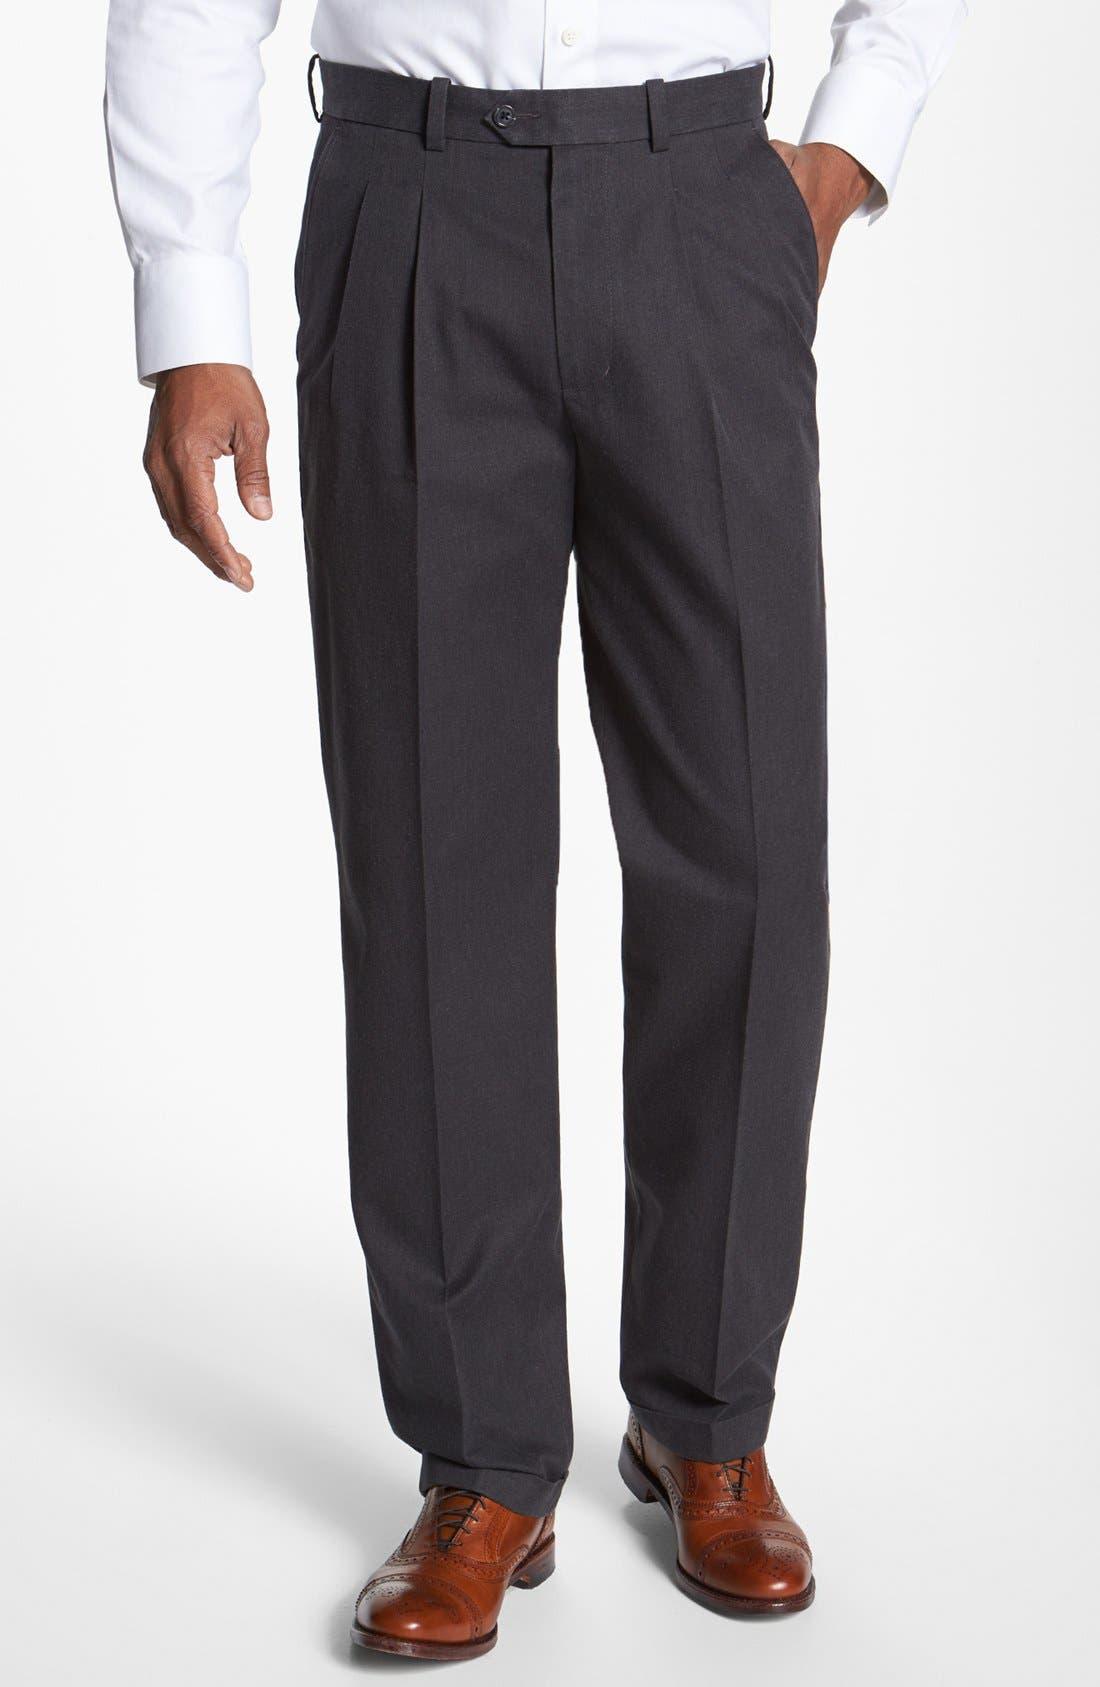 Alternate Image 1 Selected - John W. Nordstrom® Pleated Pants